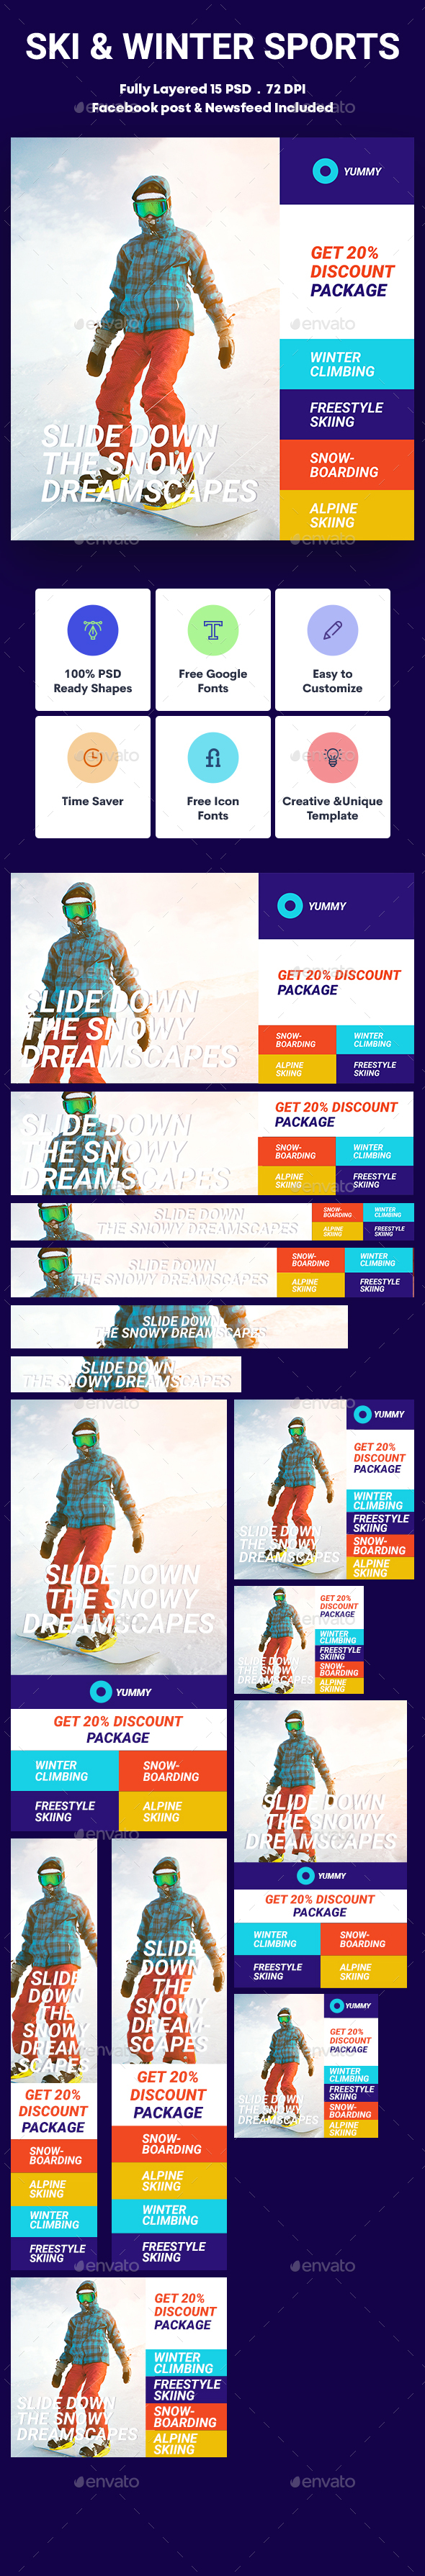 Ski & Winter Sports Banners Ad